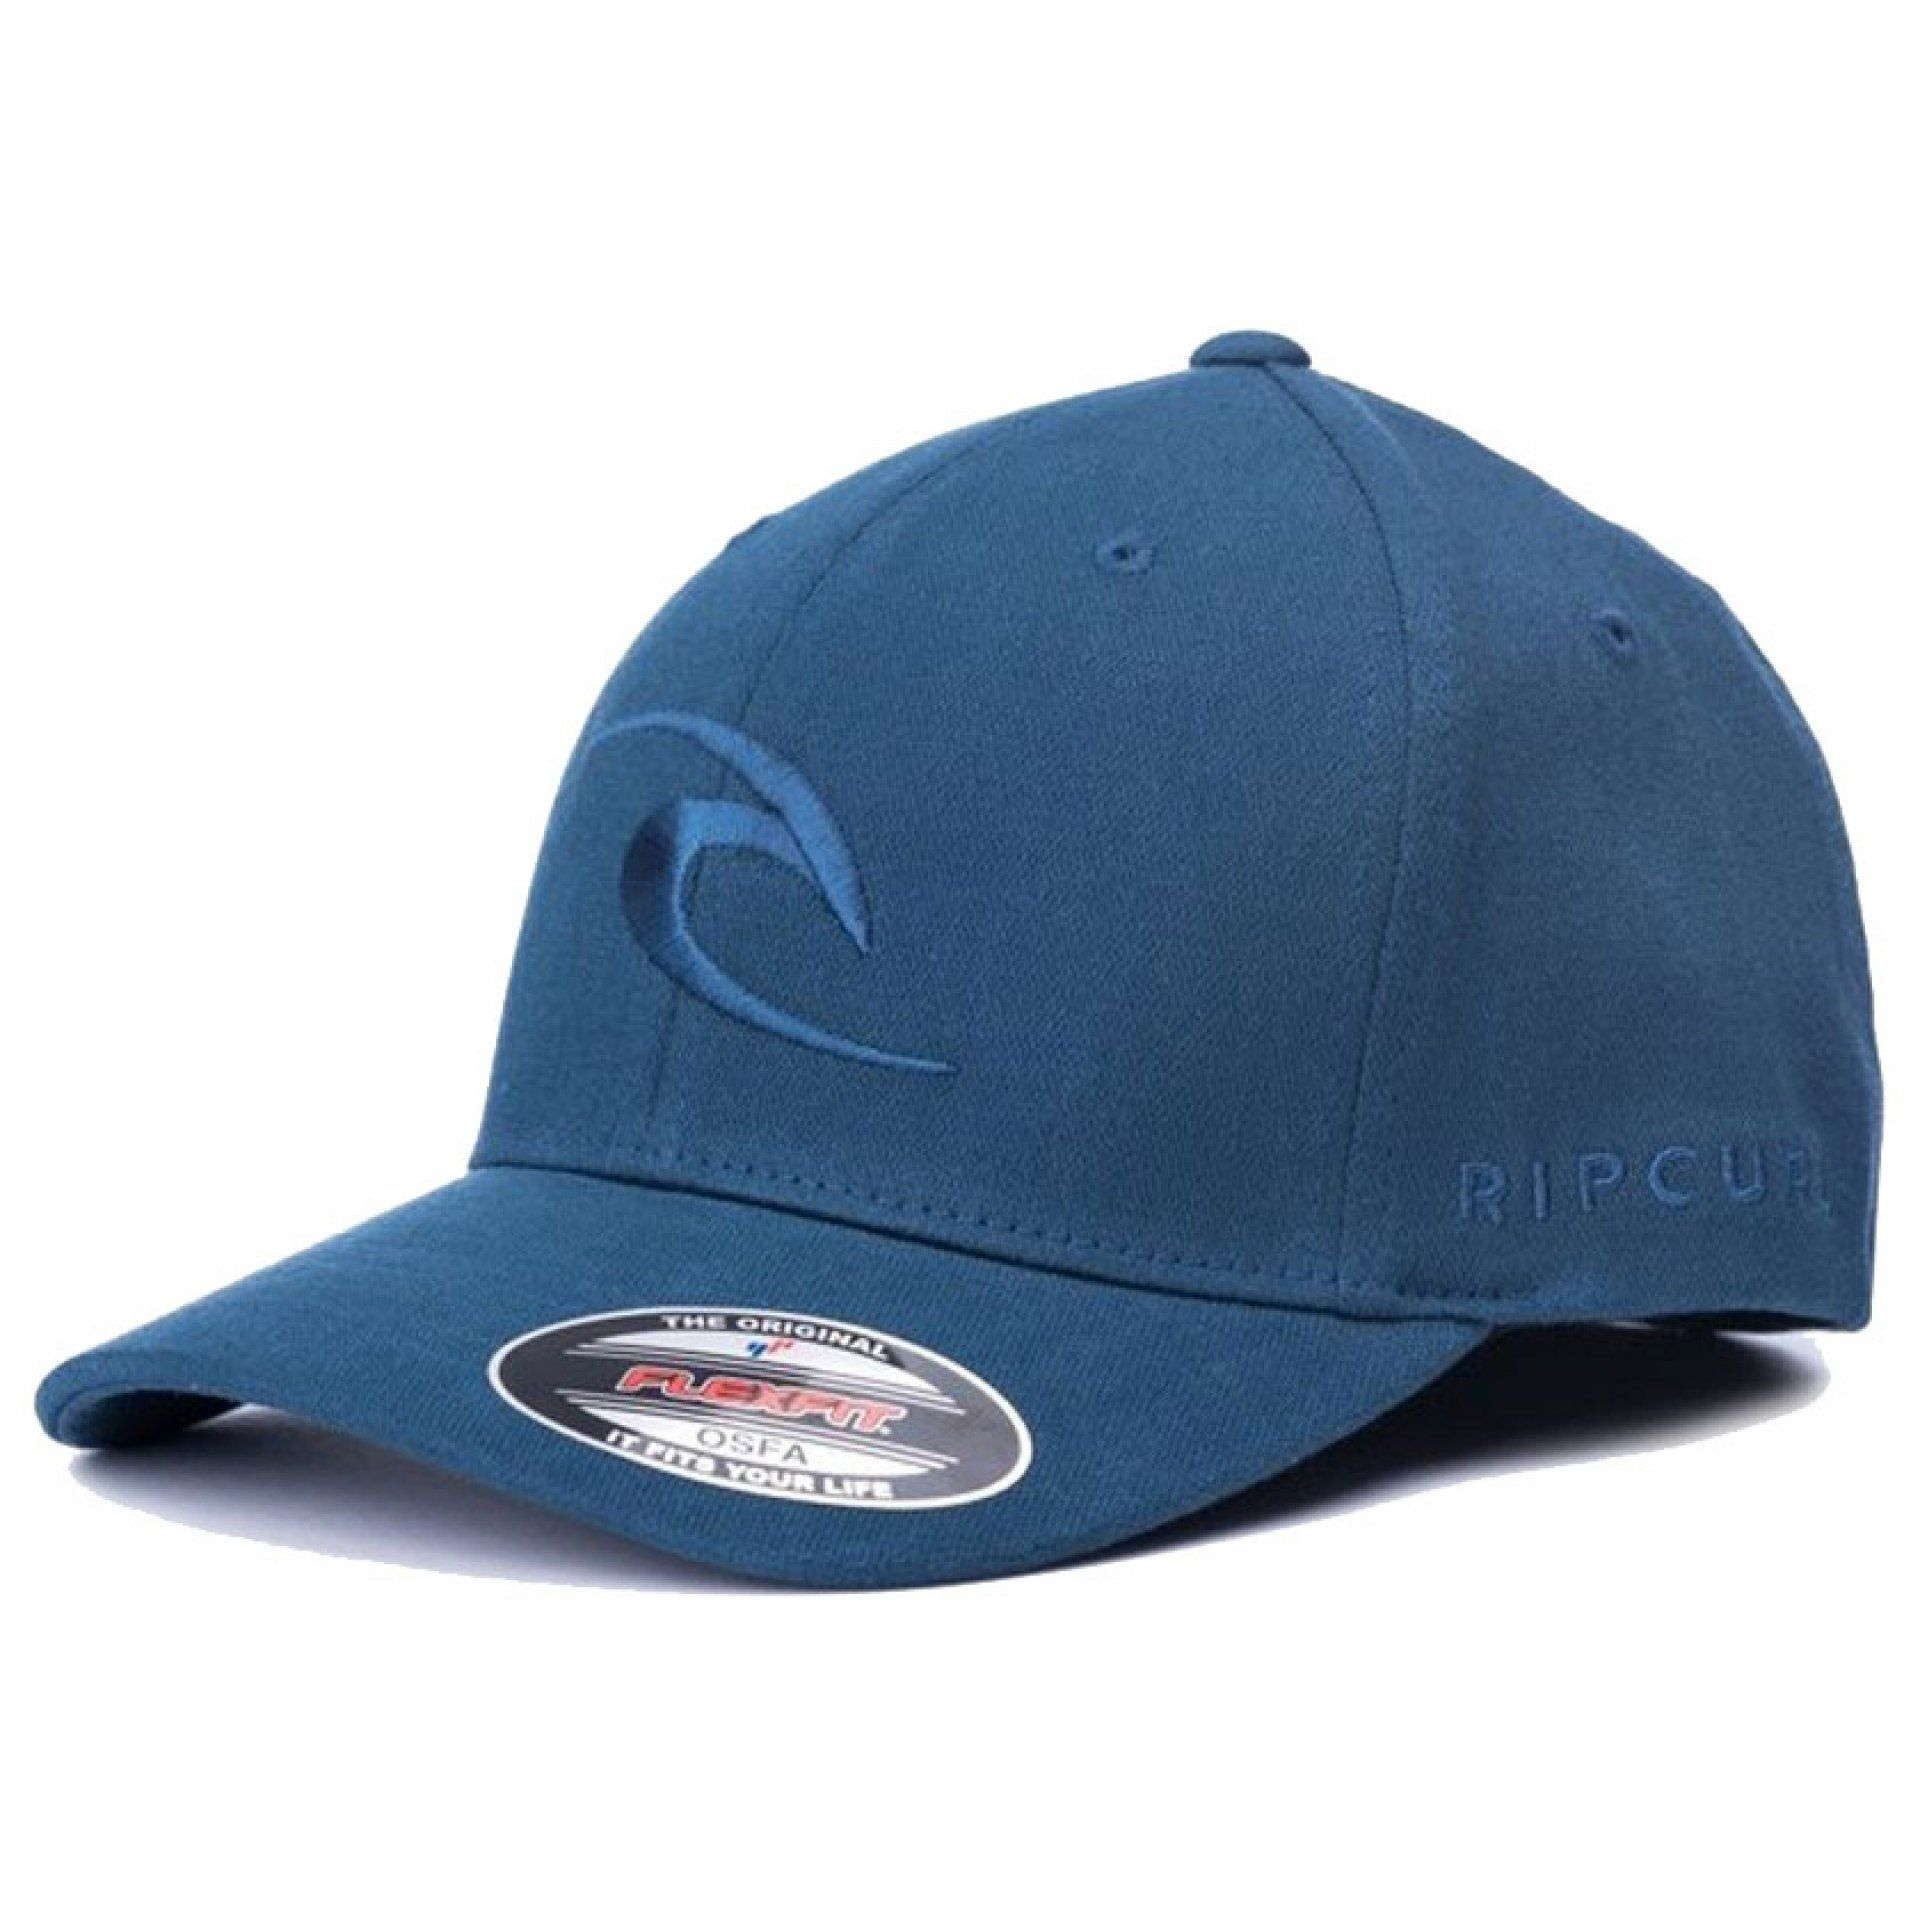 CZAPKA Z DASZKIEM RIP CURL TEPAN CURVE PEAK CAP CCANW1 70 BLUE